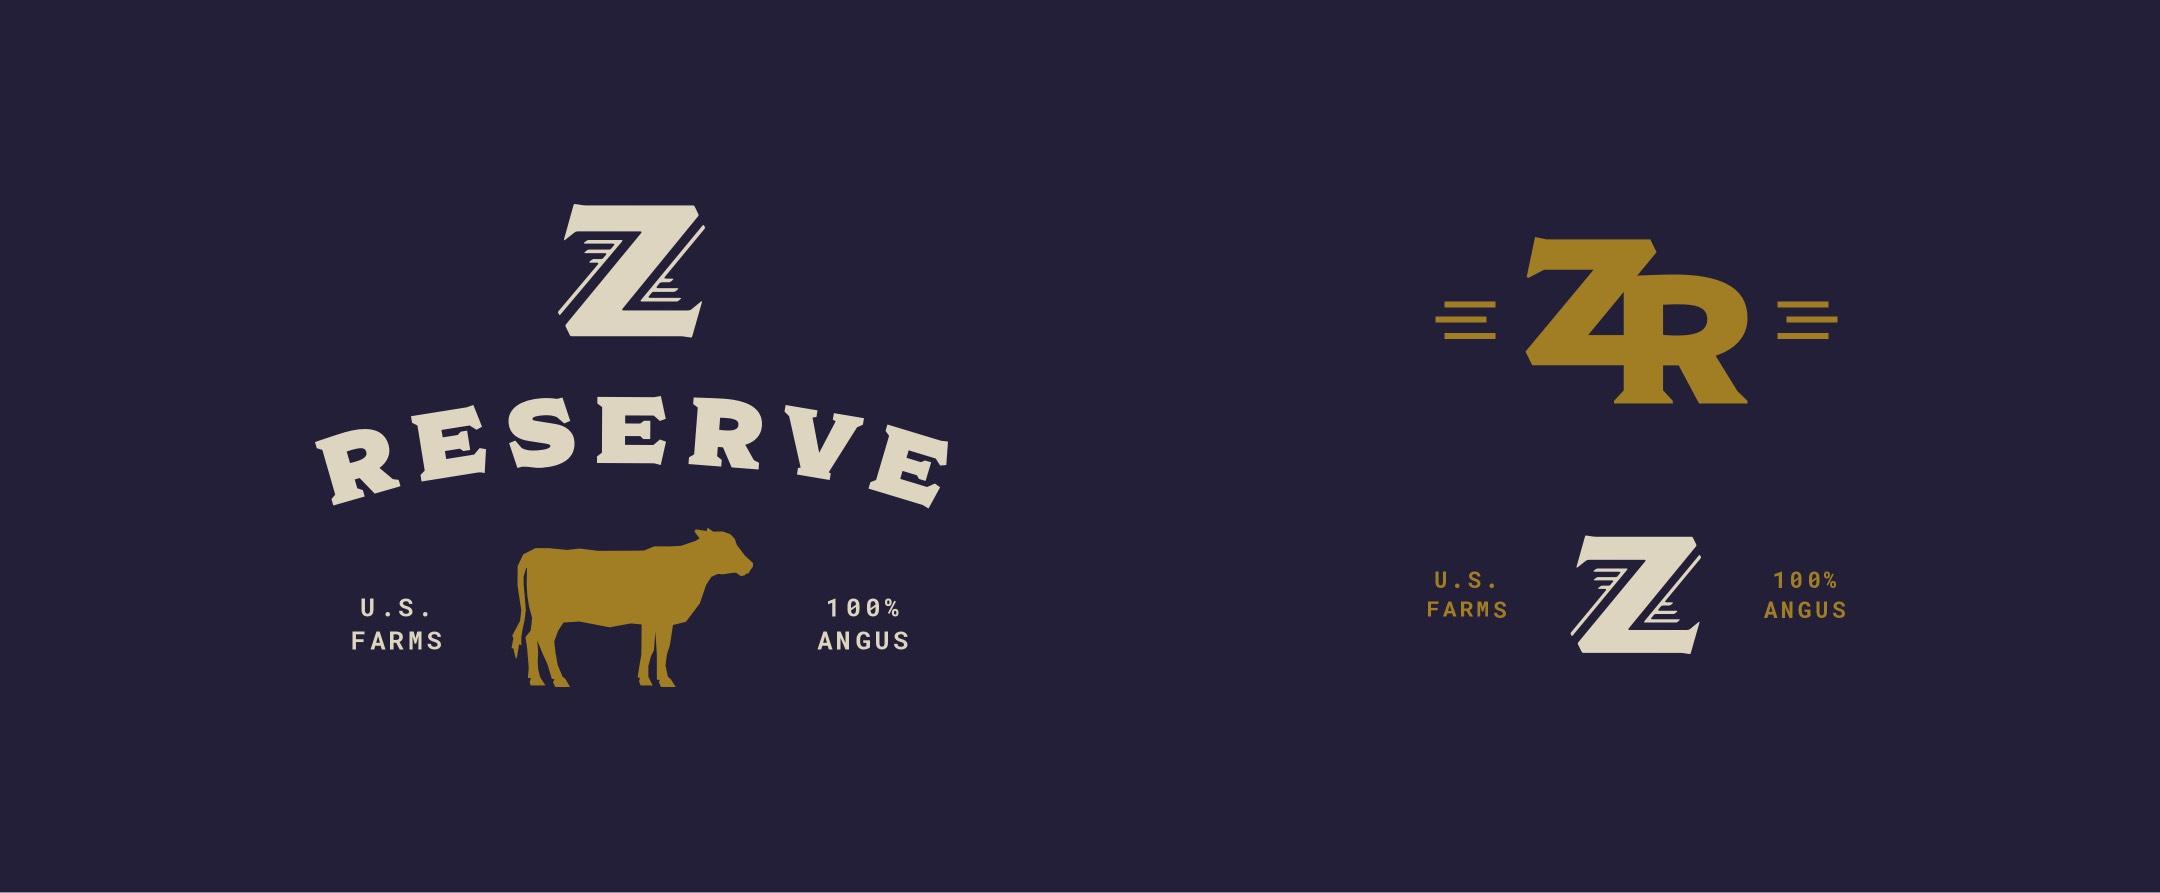 z reserve logos